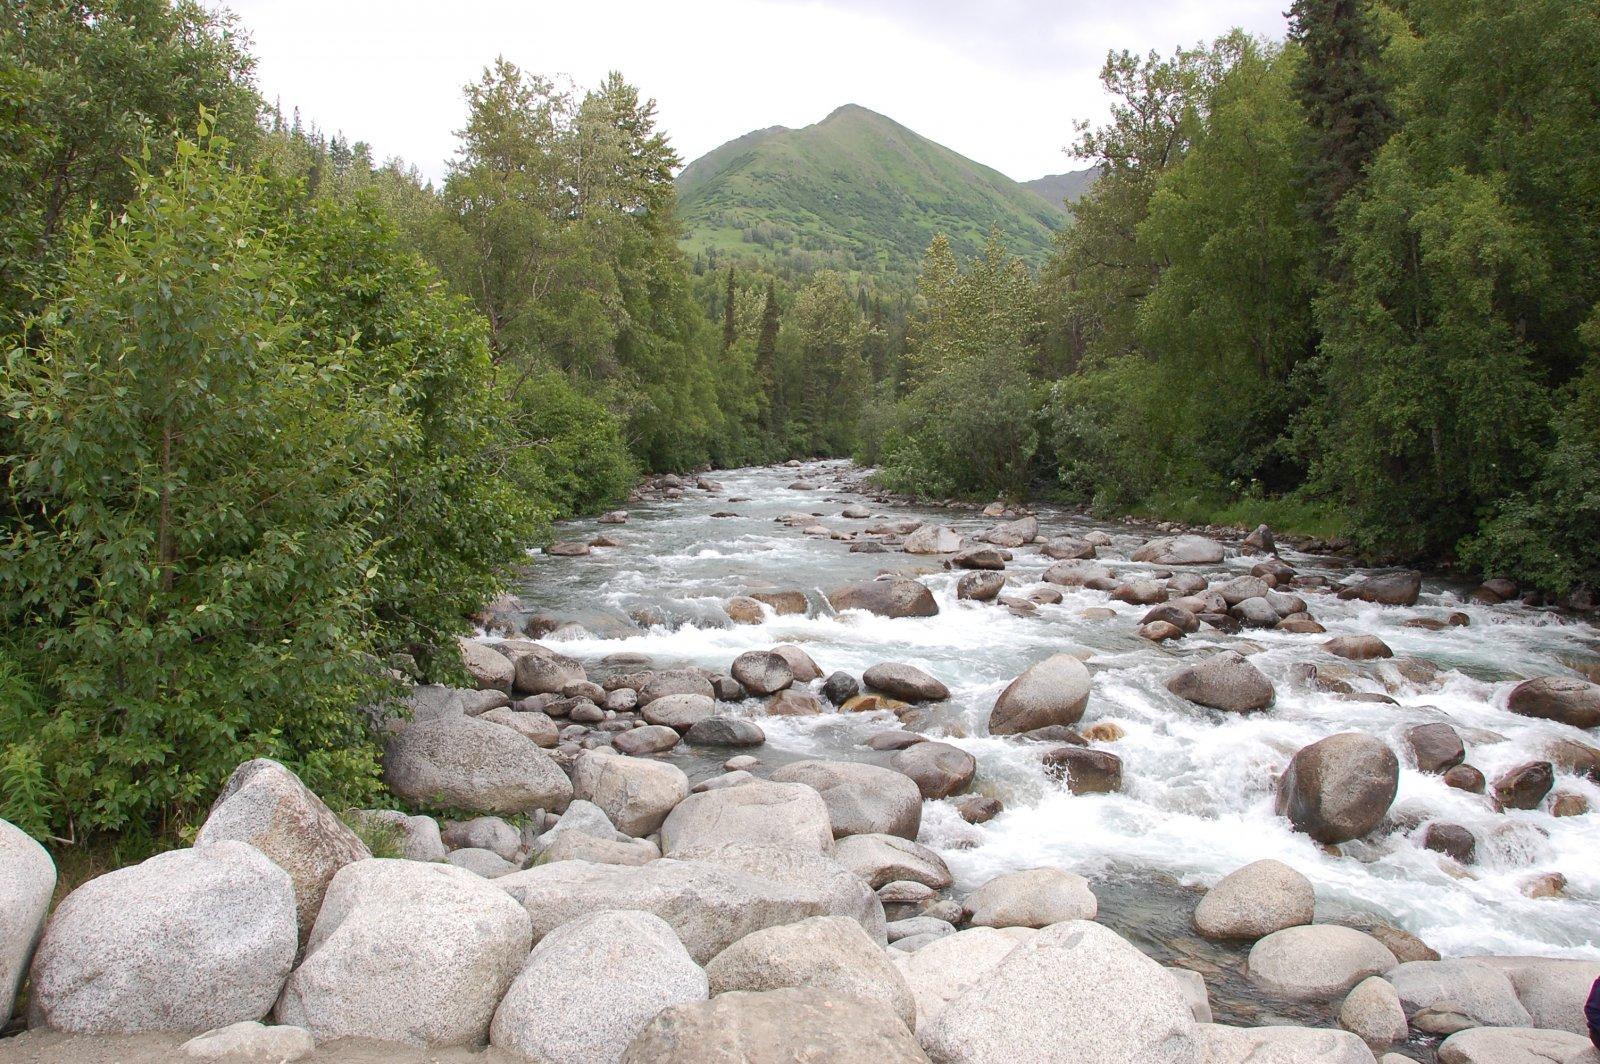 Click image for larger version  Name:Alaska Scenes 007.jpg Views:96 Size:472.6 KB ID:205694